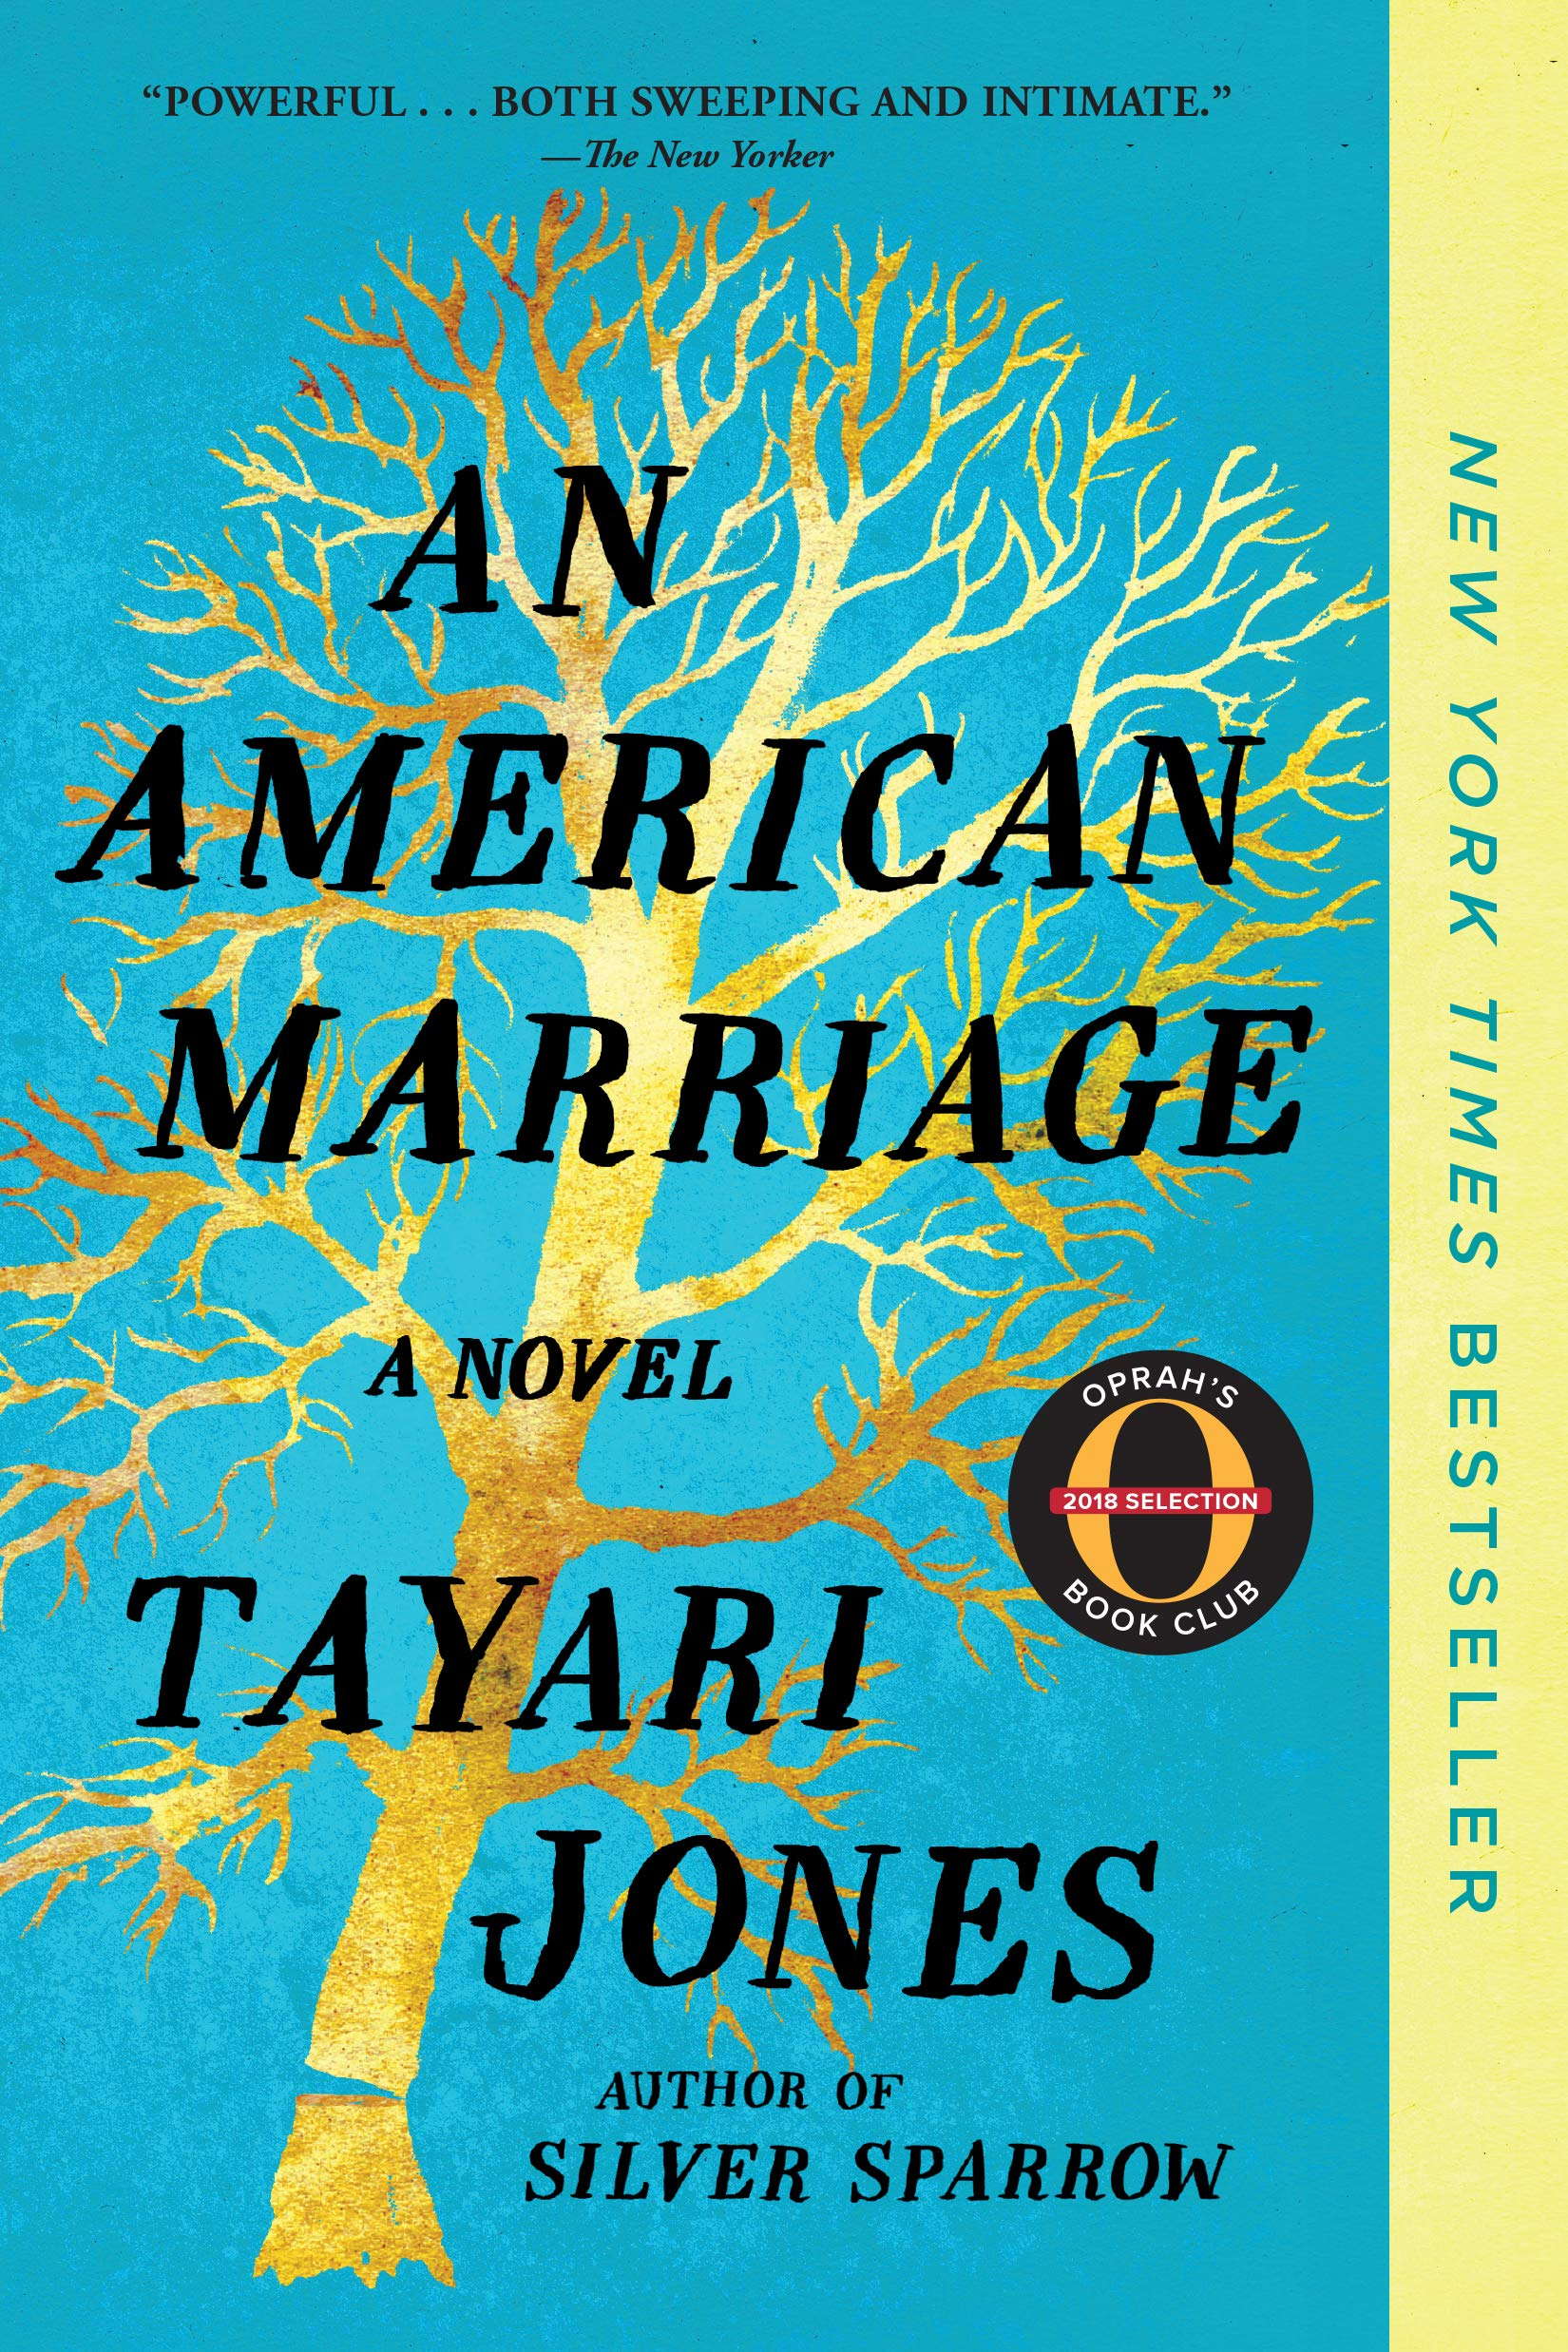 Amazon com: An American Marriage (Oprah's Book Club): A